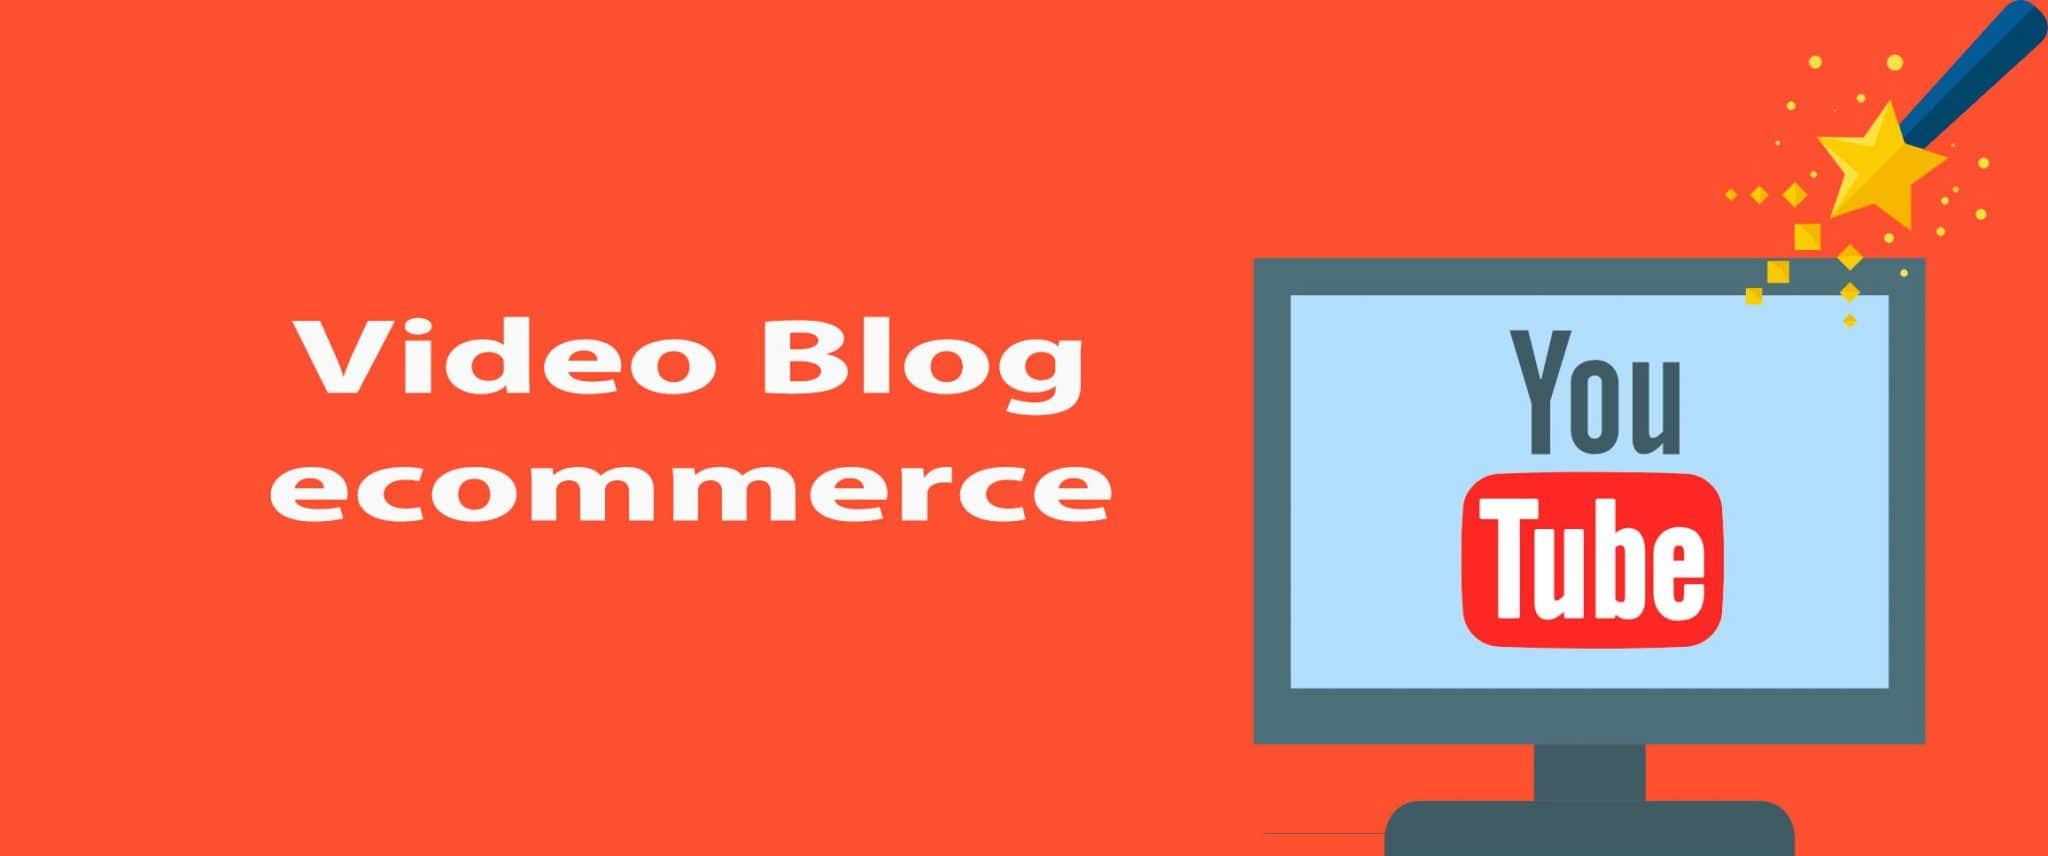 video blog ecommerce